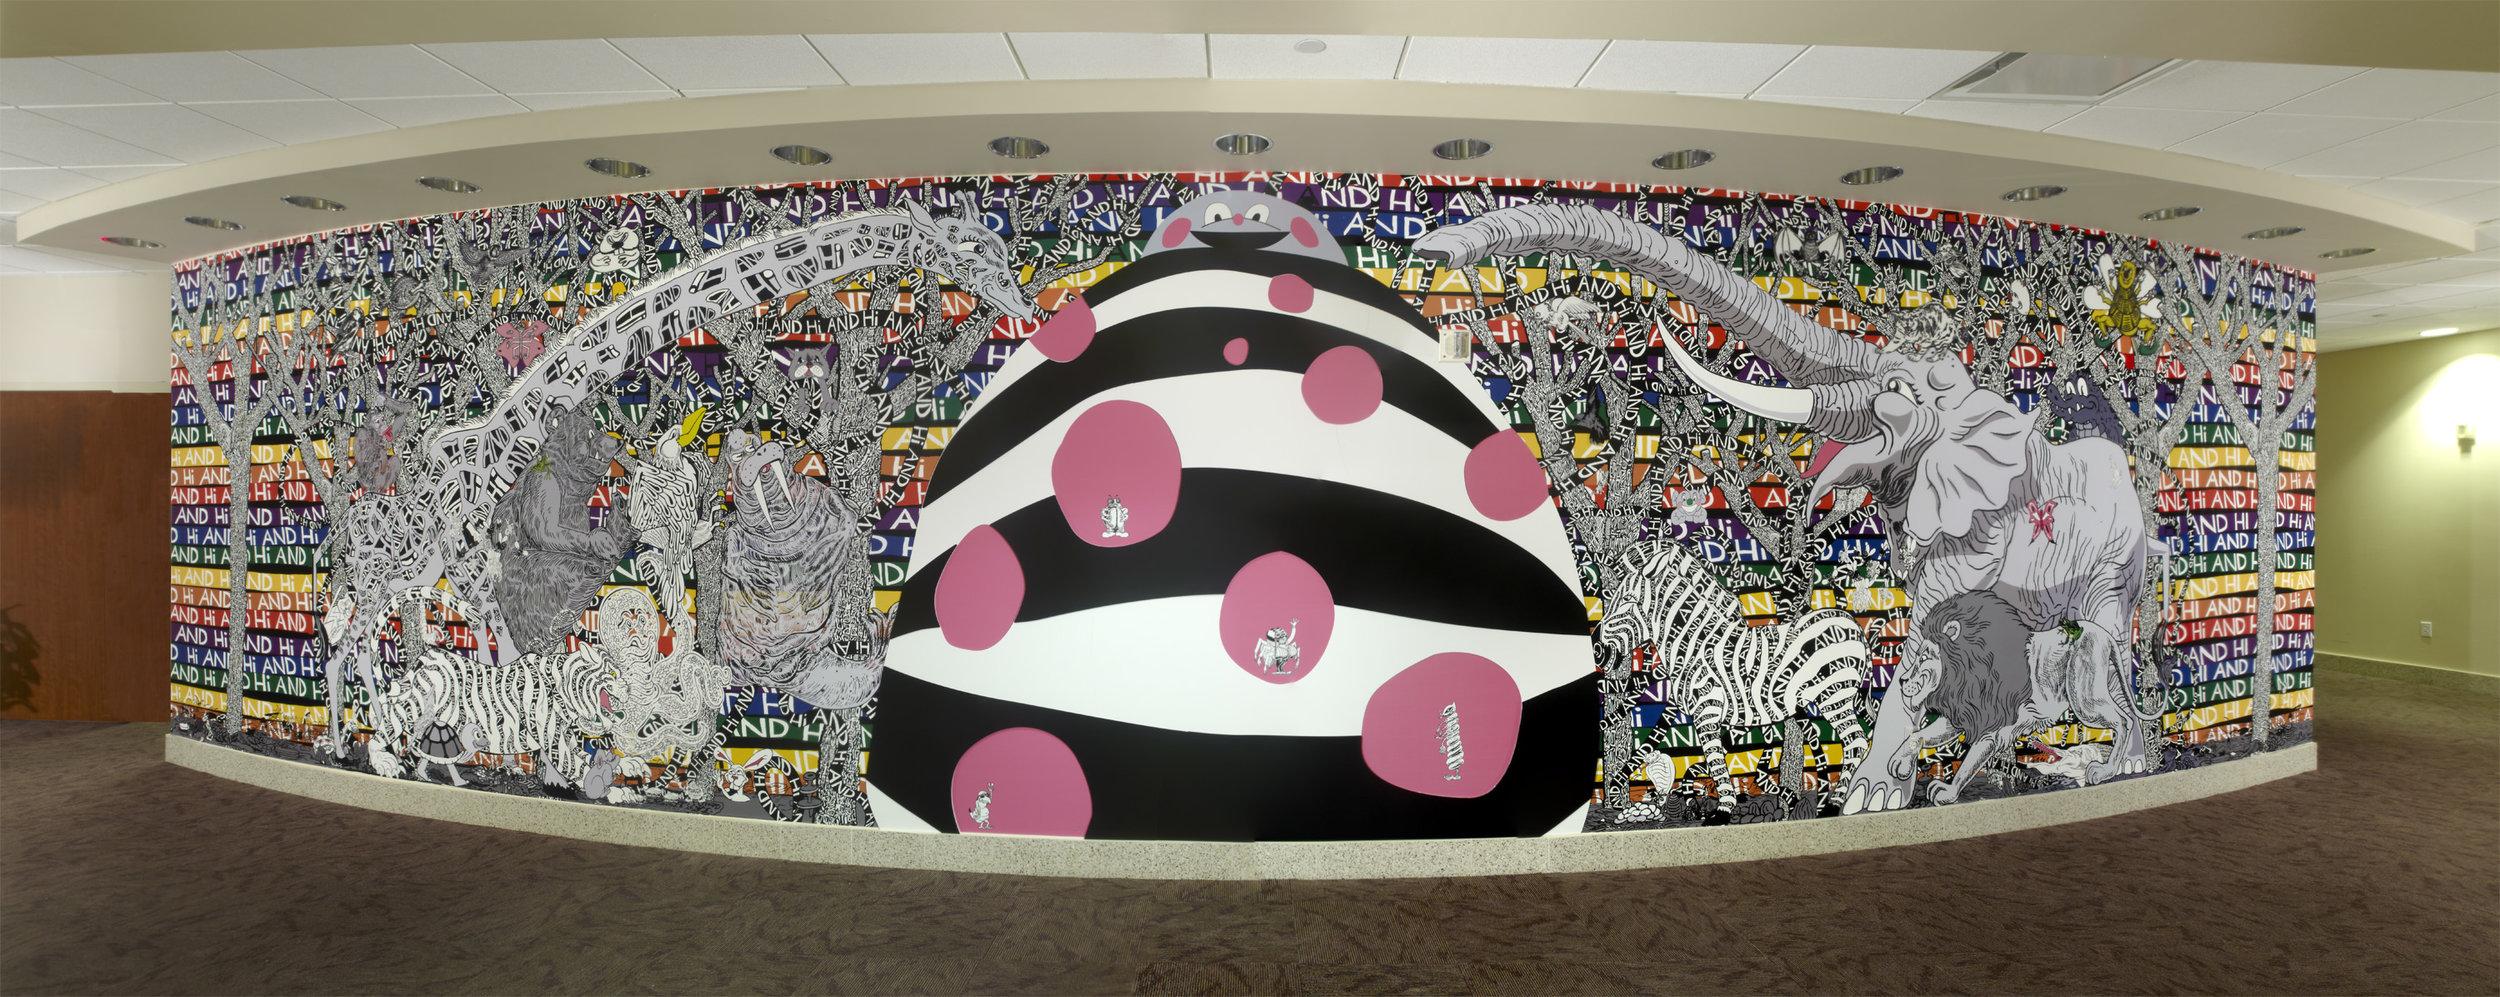 Trenton Doyle Hancock,  Hi and Hi , 2011, site-specific mural, approx. 8 x 39 ft. Children's Memorial Hermann Hospital. Photograph by Kara Trail